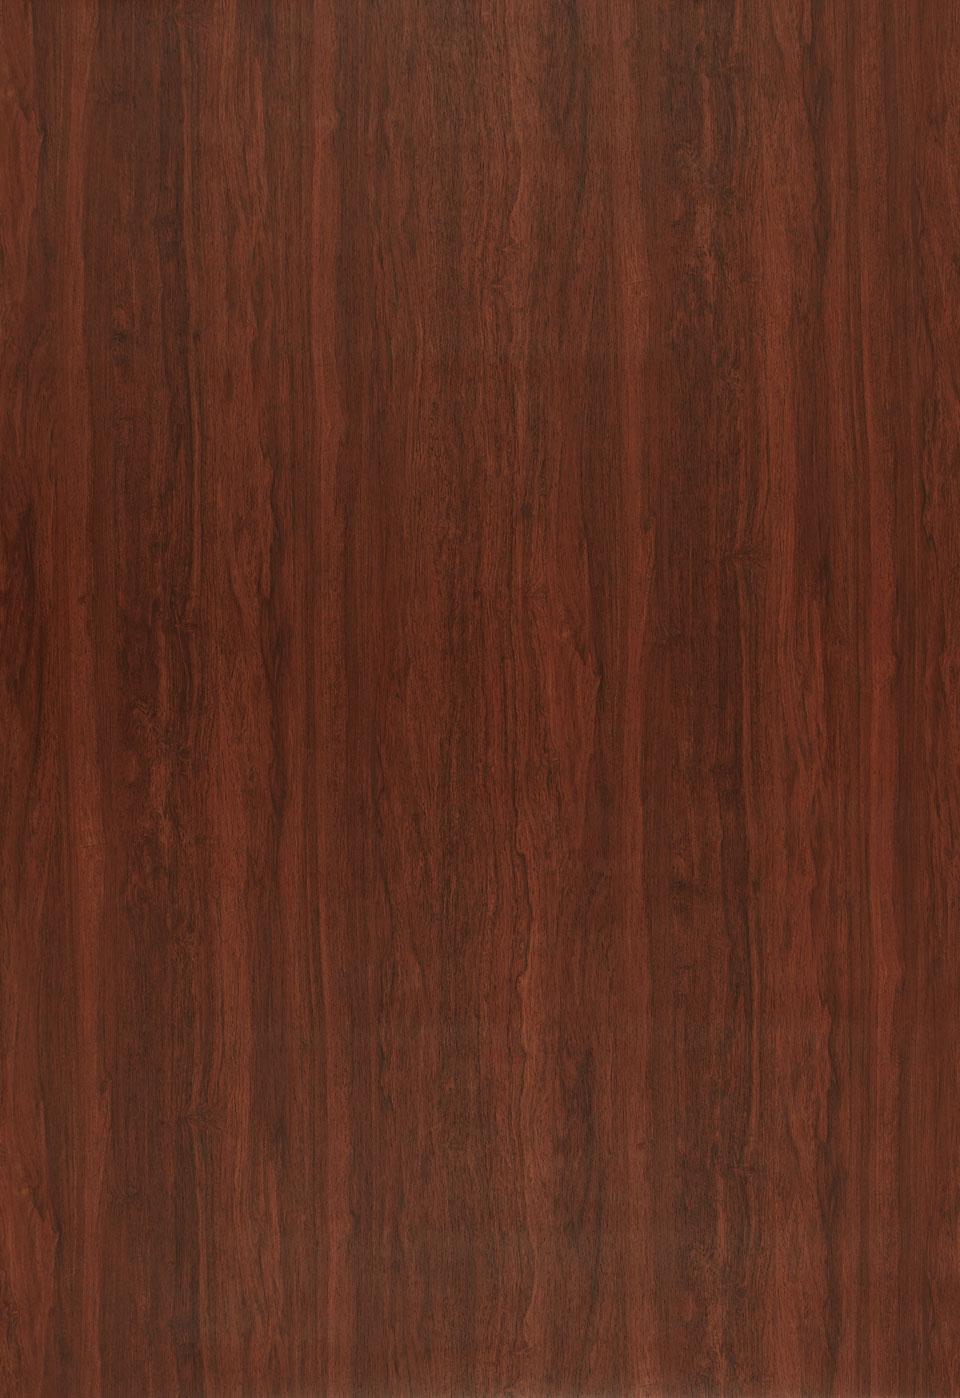 wood grain page 4